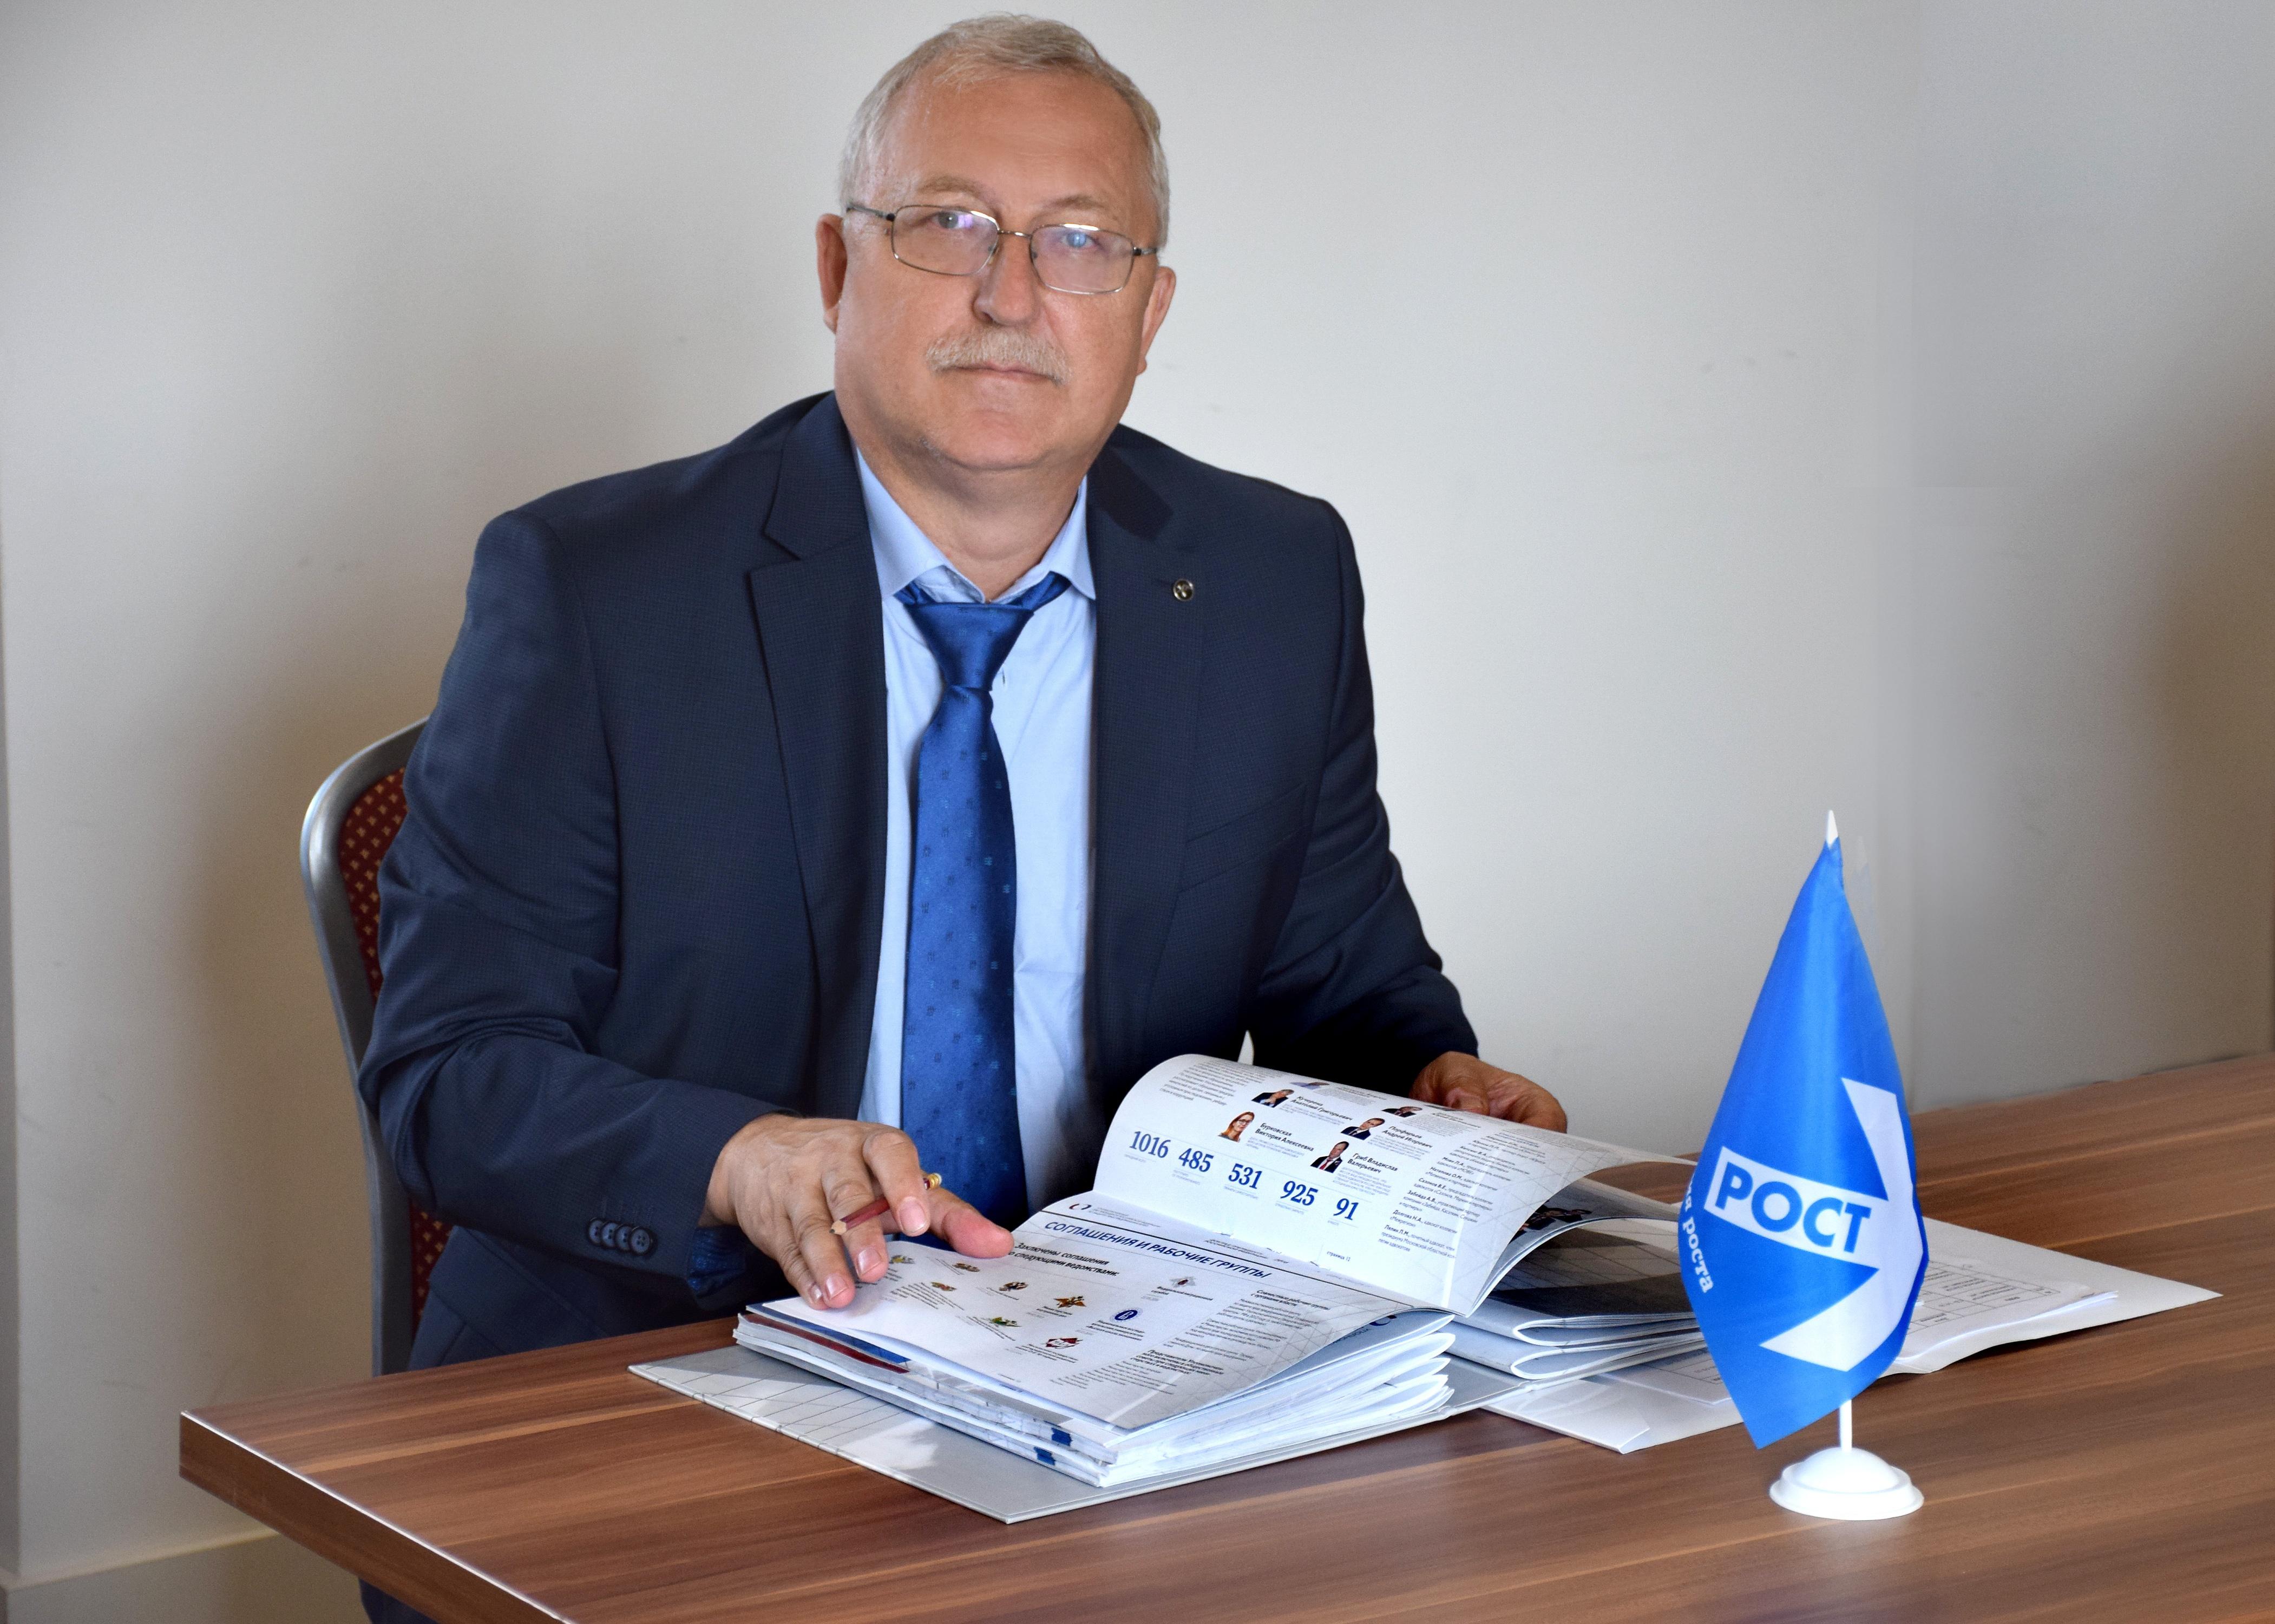 Декан факультета журналистики ВГУ Владимир Тулупов баллотируется в Госдуму